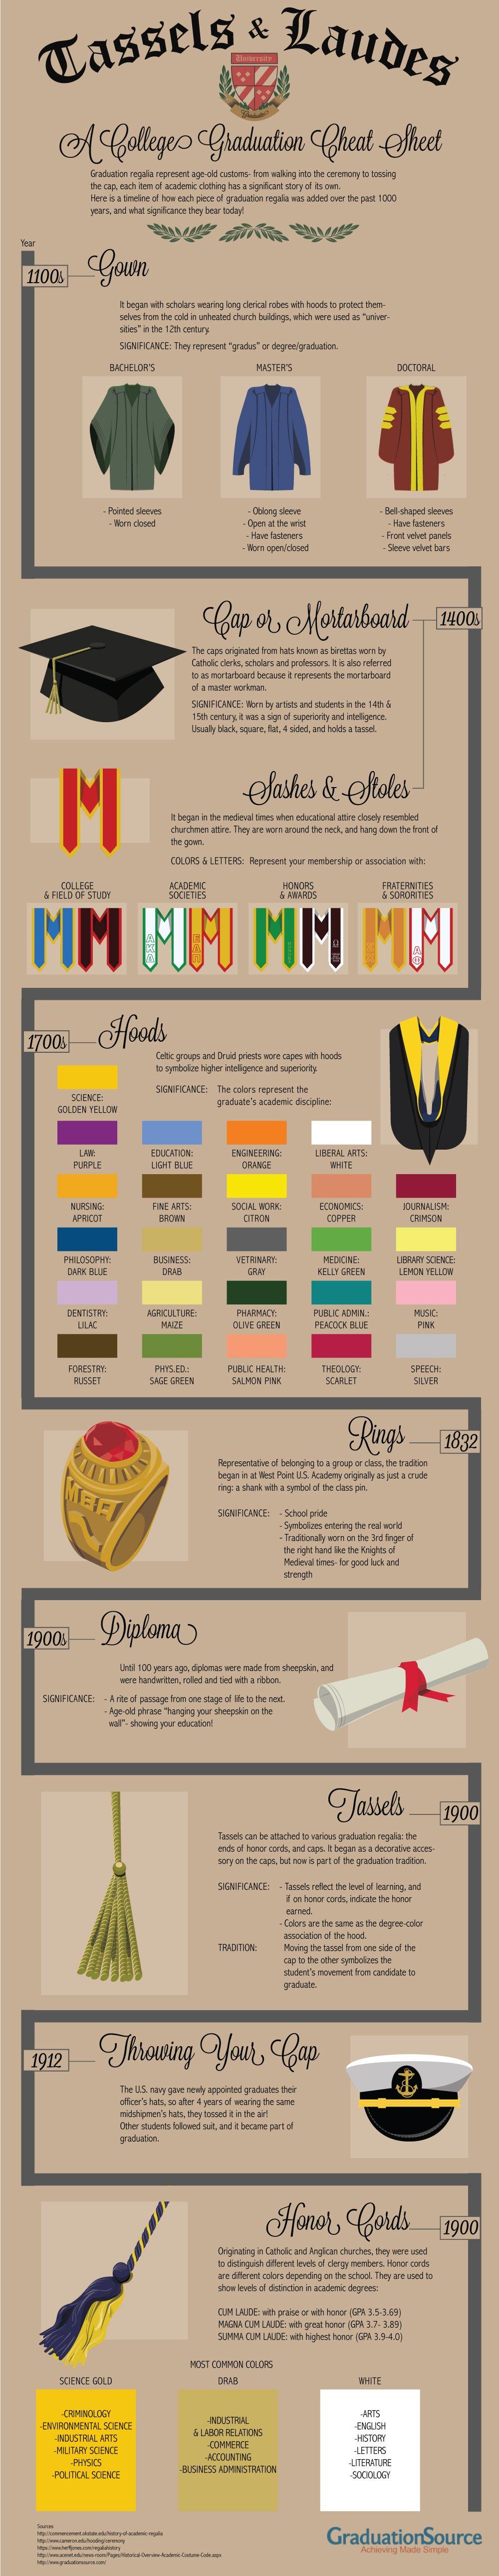 Tassels & Laudes Infographic